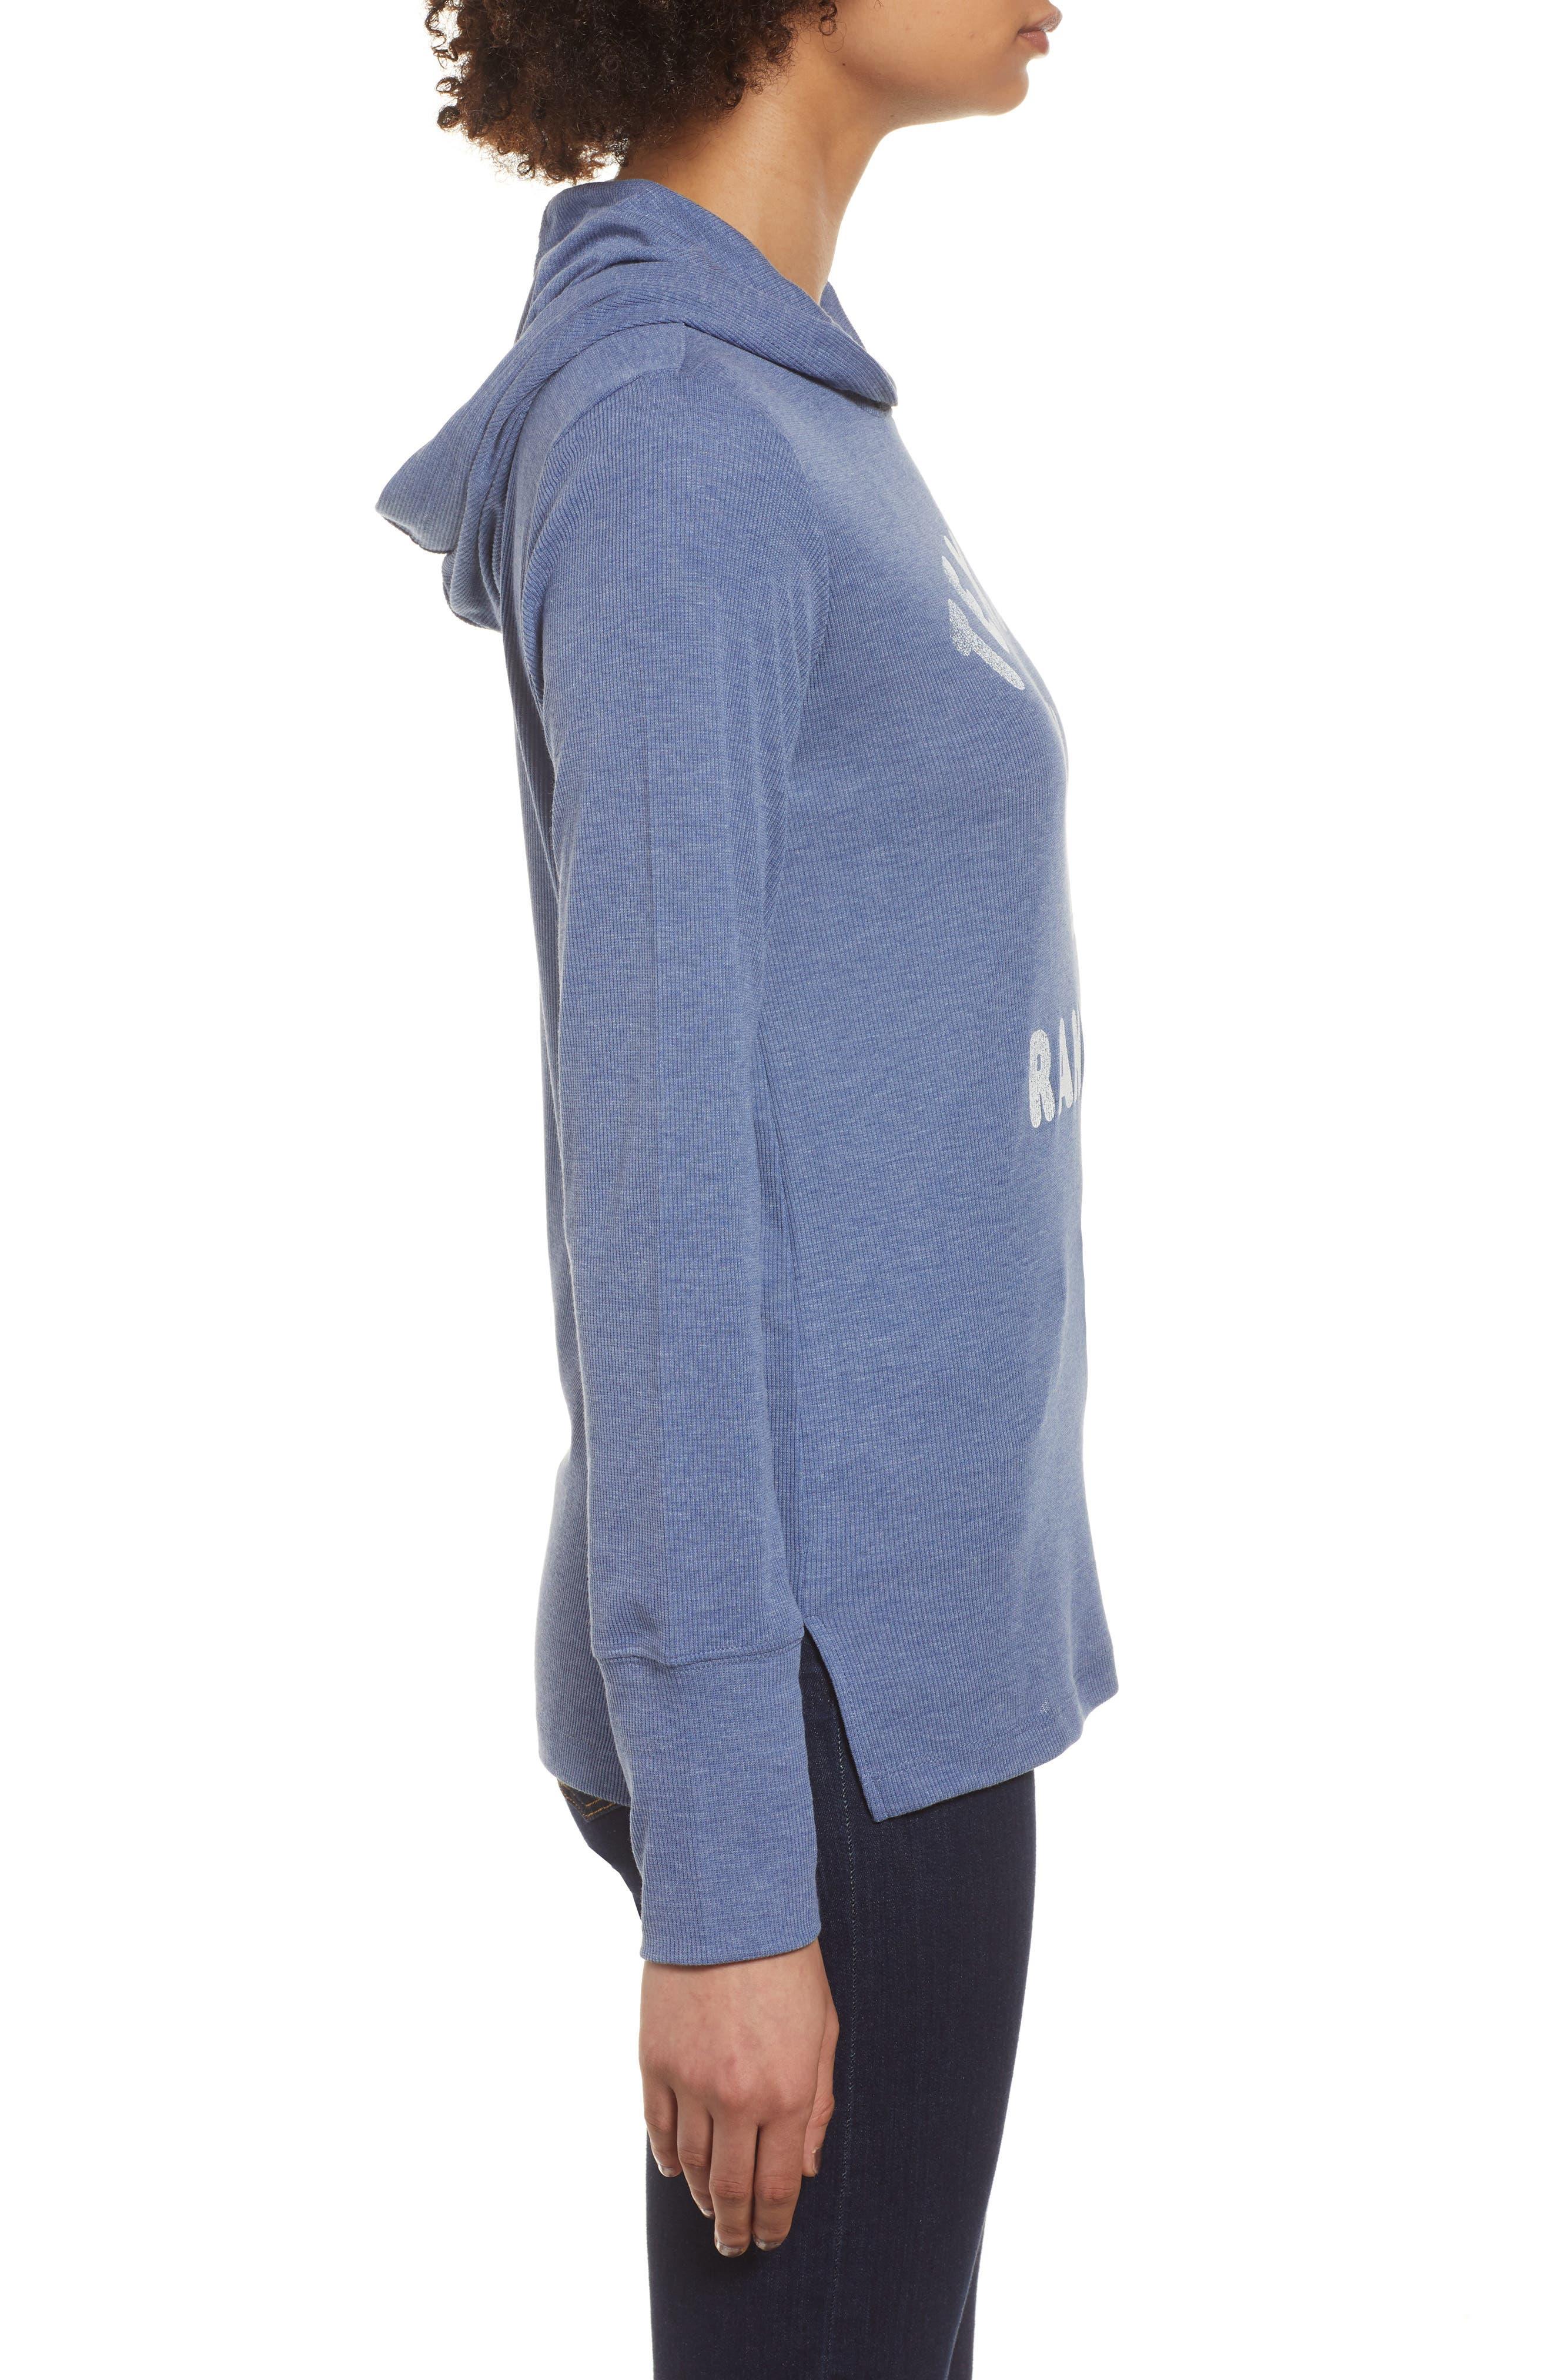 Campbell Texas Rangers Rib Knit Hooded Top,                             Alternate thumbnail 3, color,                             Bleacher Blue